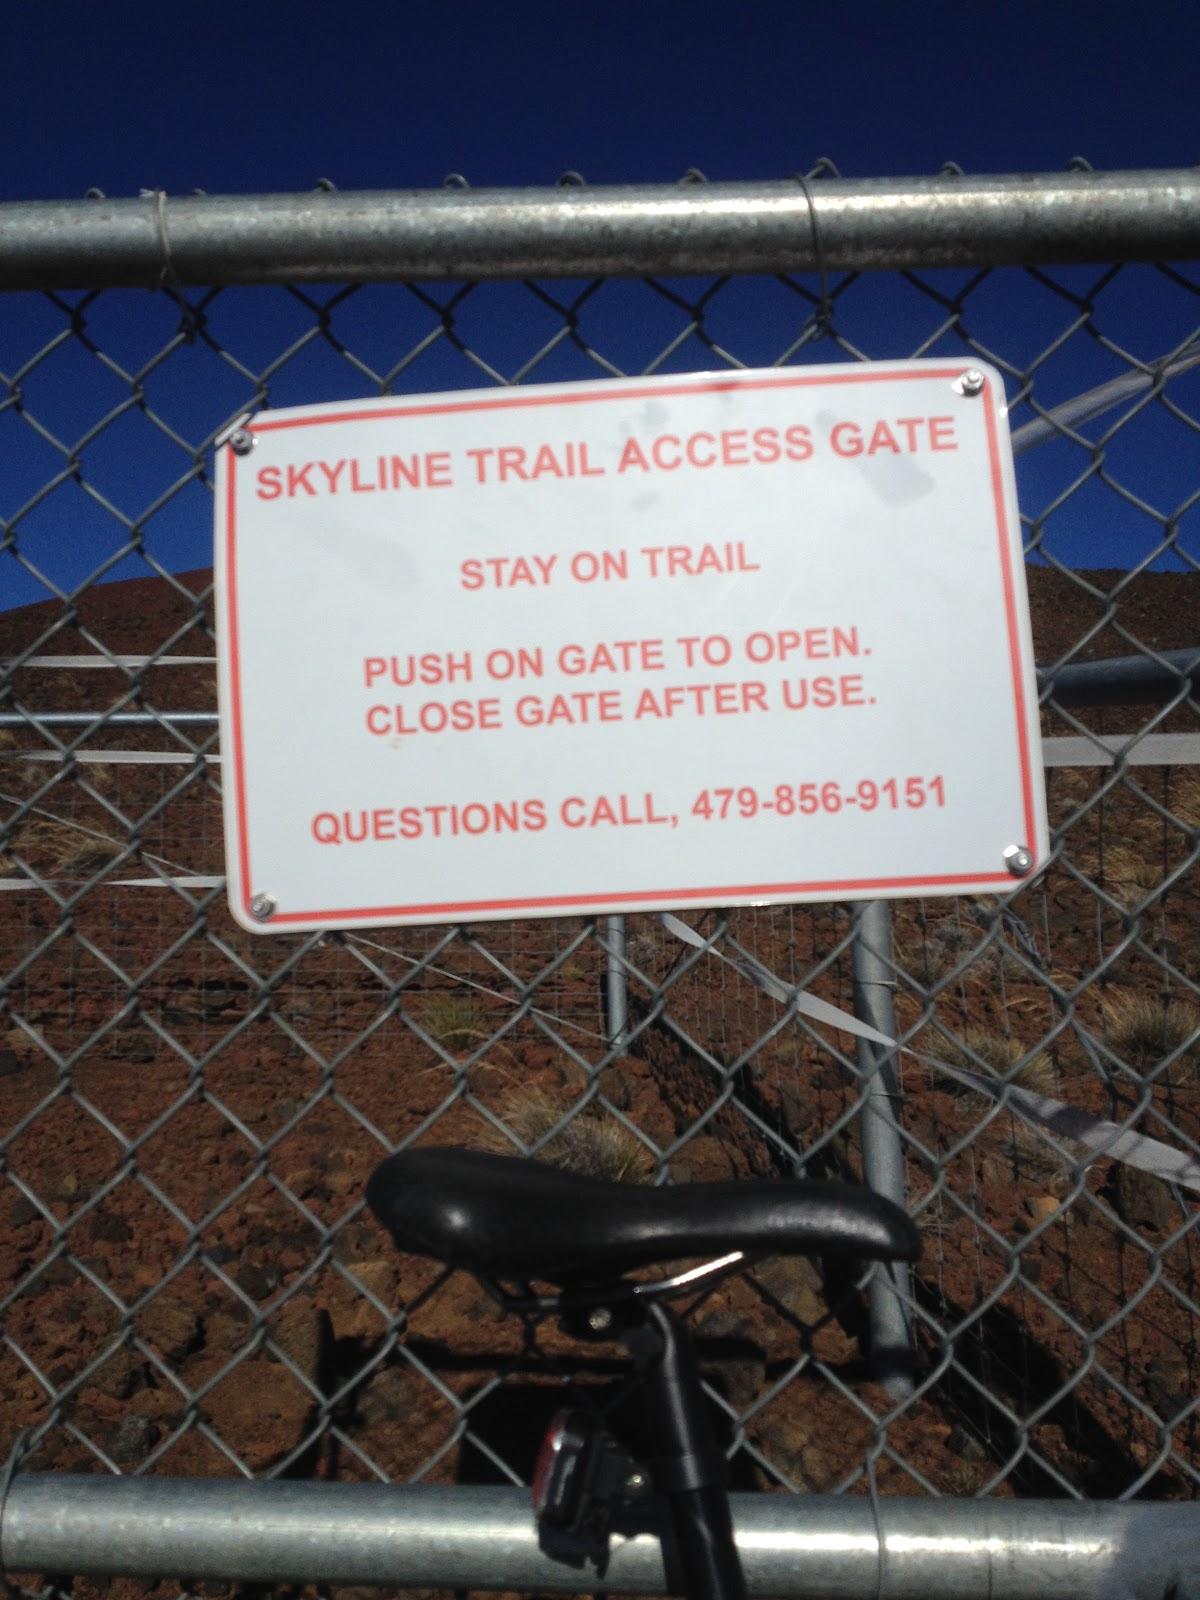 Skyline Trail access gate sign 2.jpg